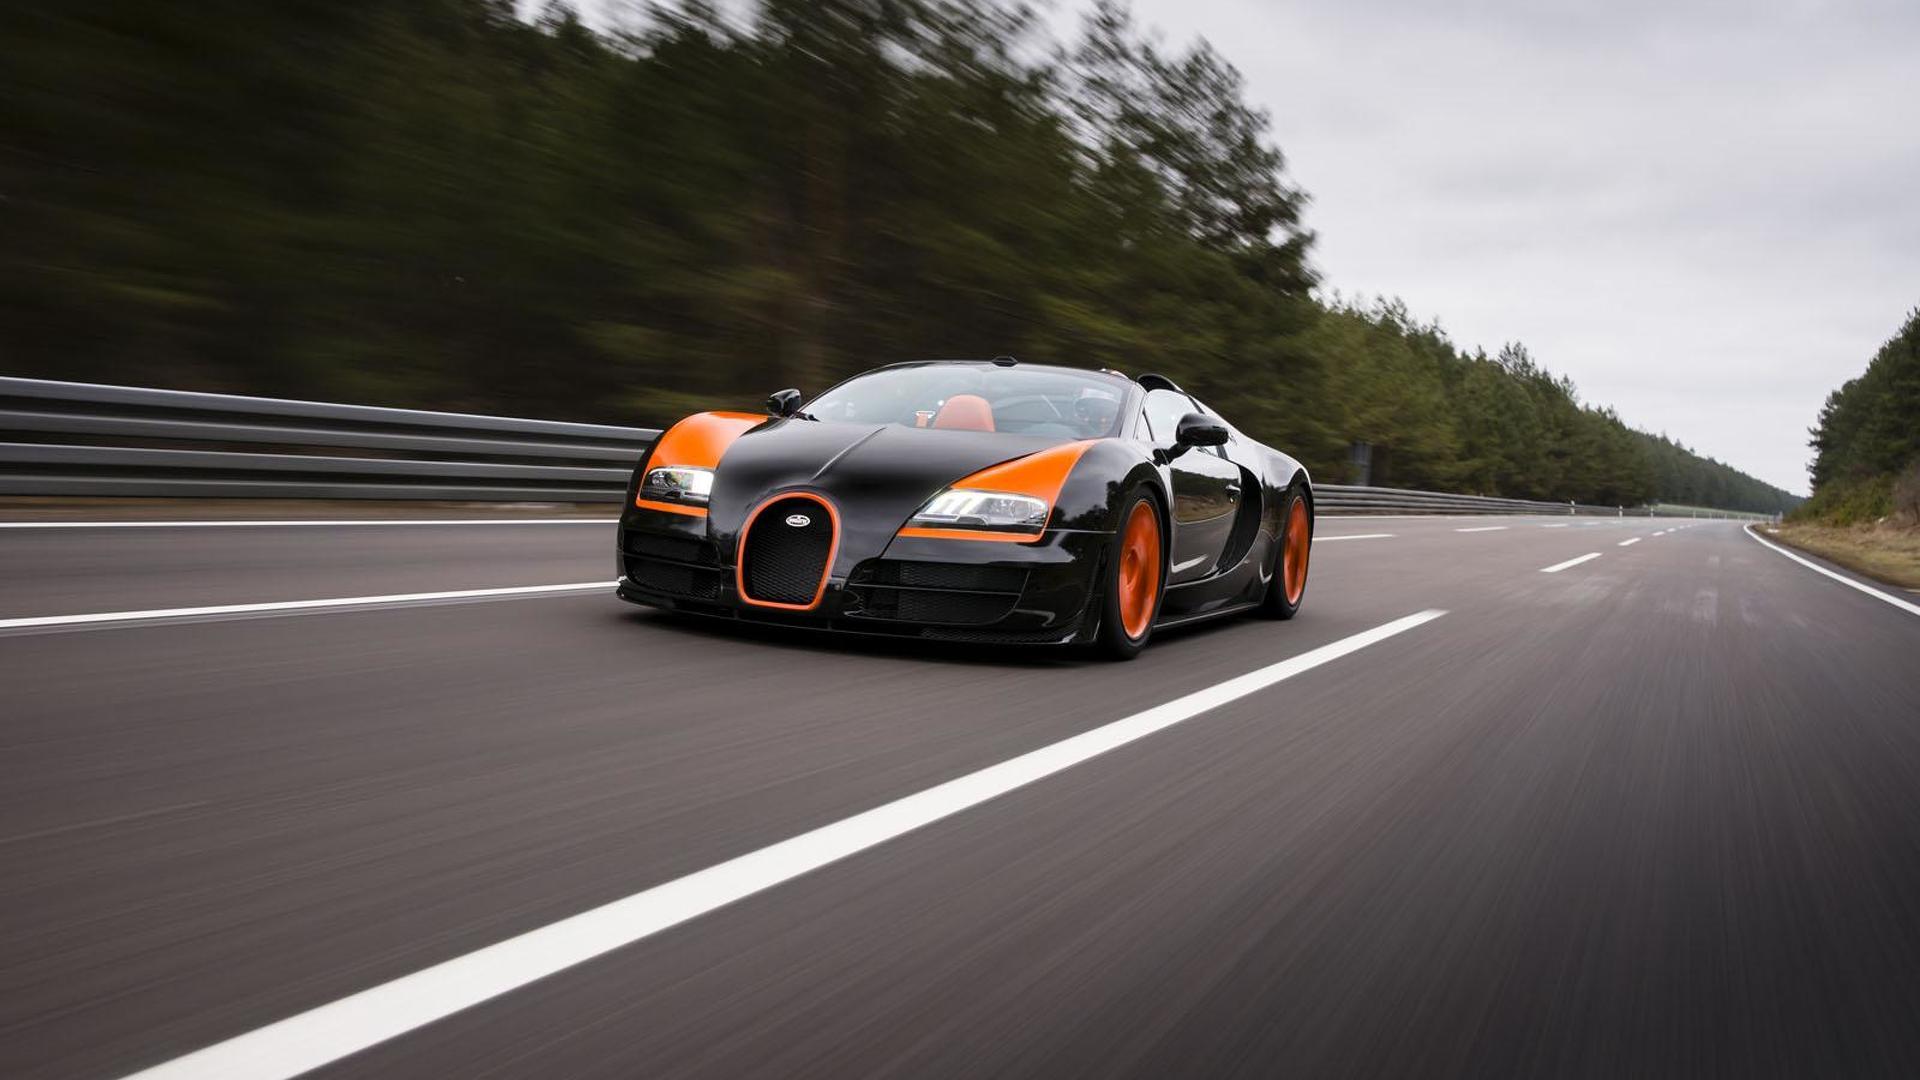 2013-377548-bugatti-veyron-grand-sport-vitesse-world-record-car-edition-11-4-20131 Inspiring Bugatti Veyron Grand Sport Vitesse Wrc Cars Trend